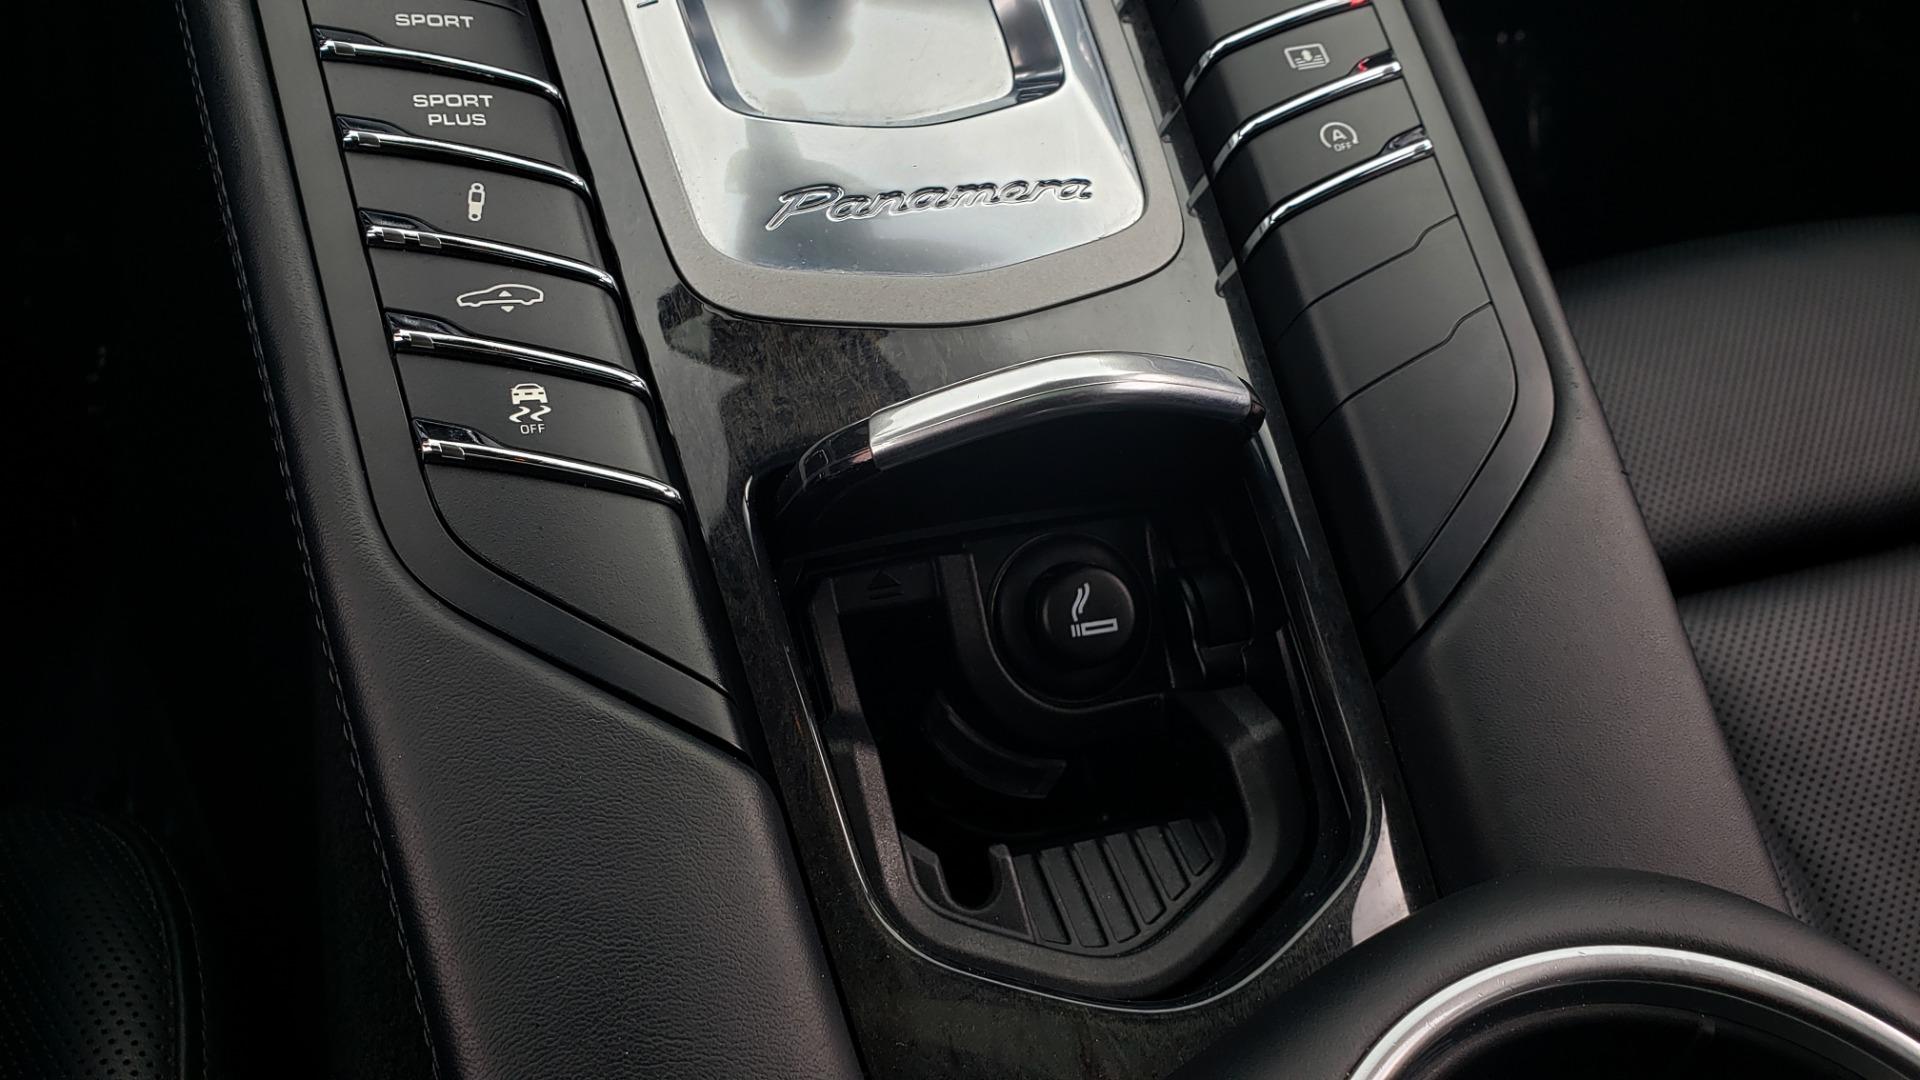 Used 2013 Porsche PANAMERA TURBO 4.8L V8 / AWD / NAV / SUNROOF / LCA / PARK ASST / BURMESTER for sale $45,995 at Formula Imports in Charlotte NC 28227 57